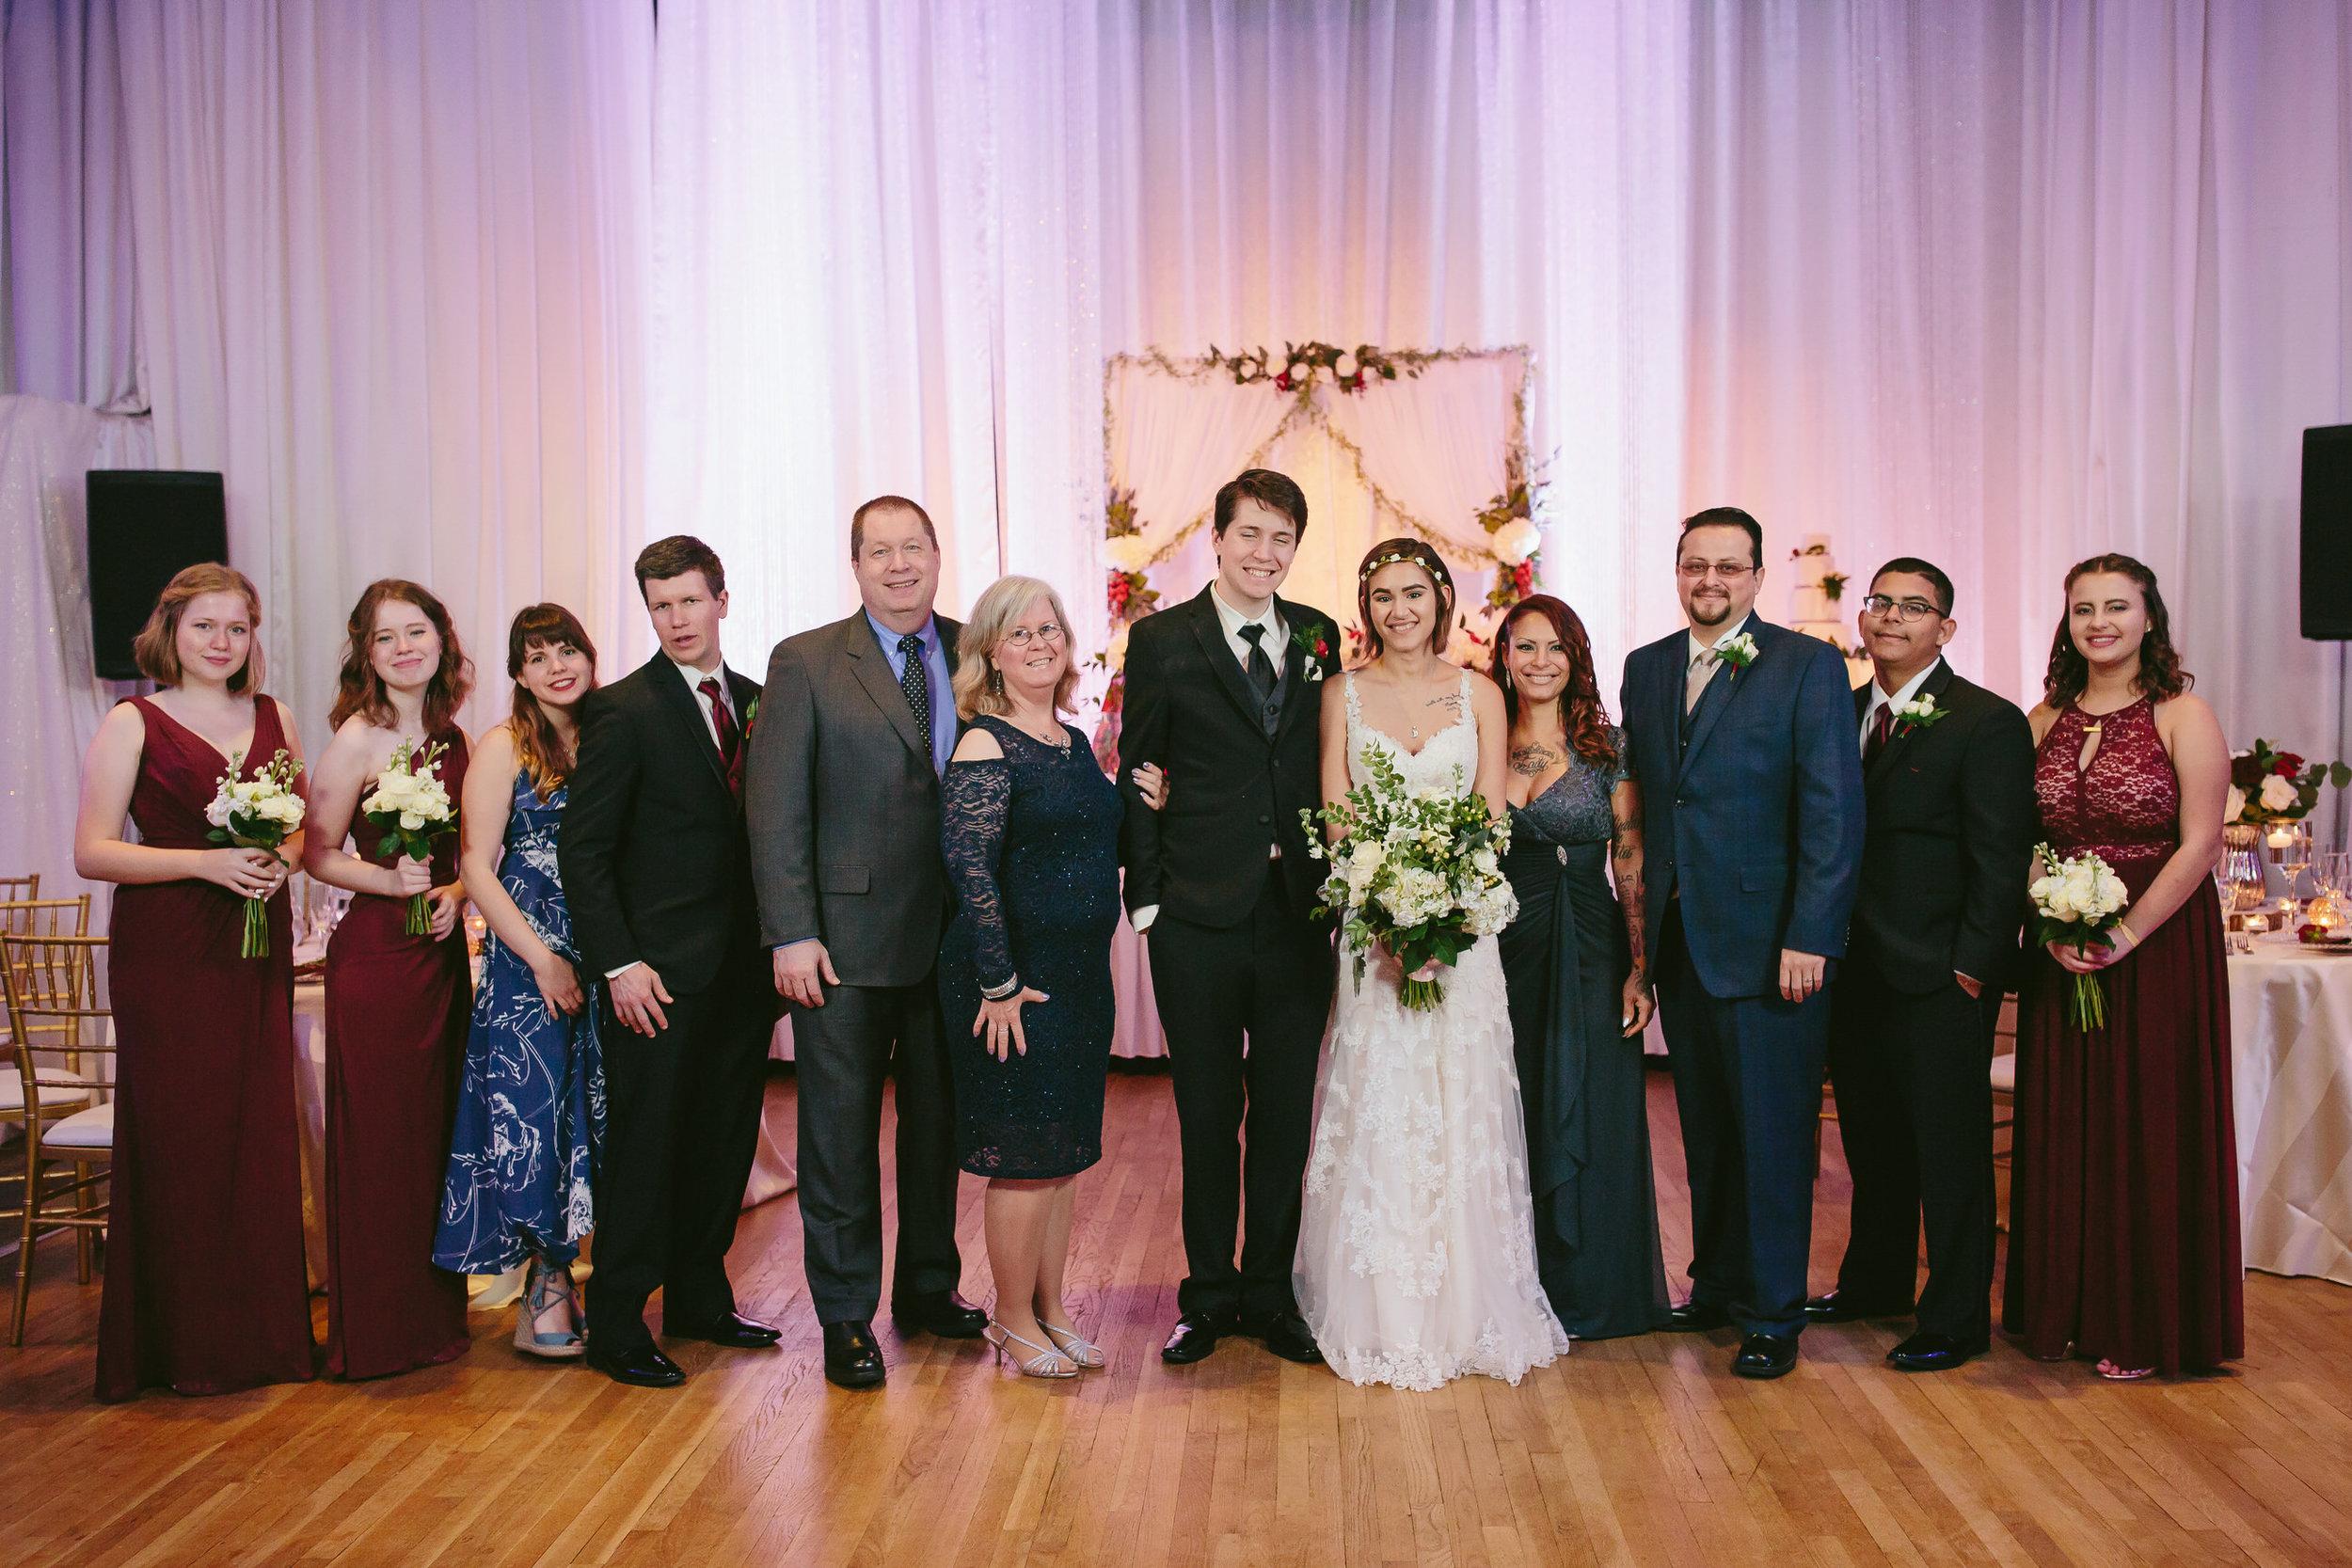 family_formals_tiny_house_photo_best_wedding_photographer.jpg